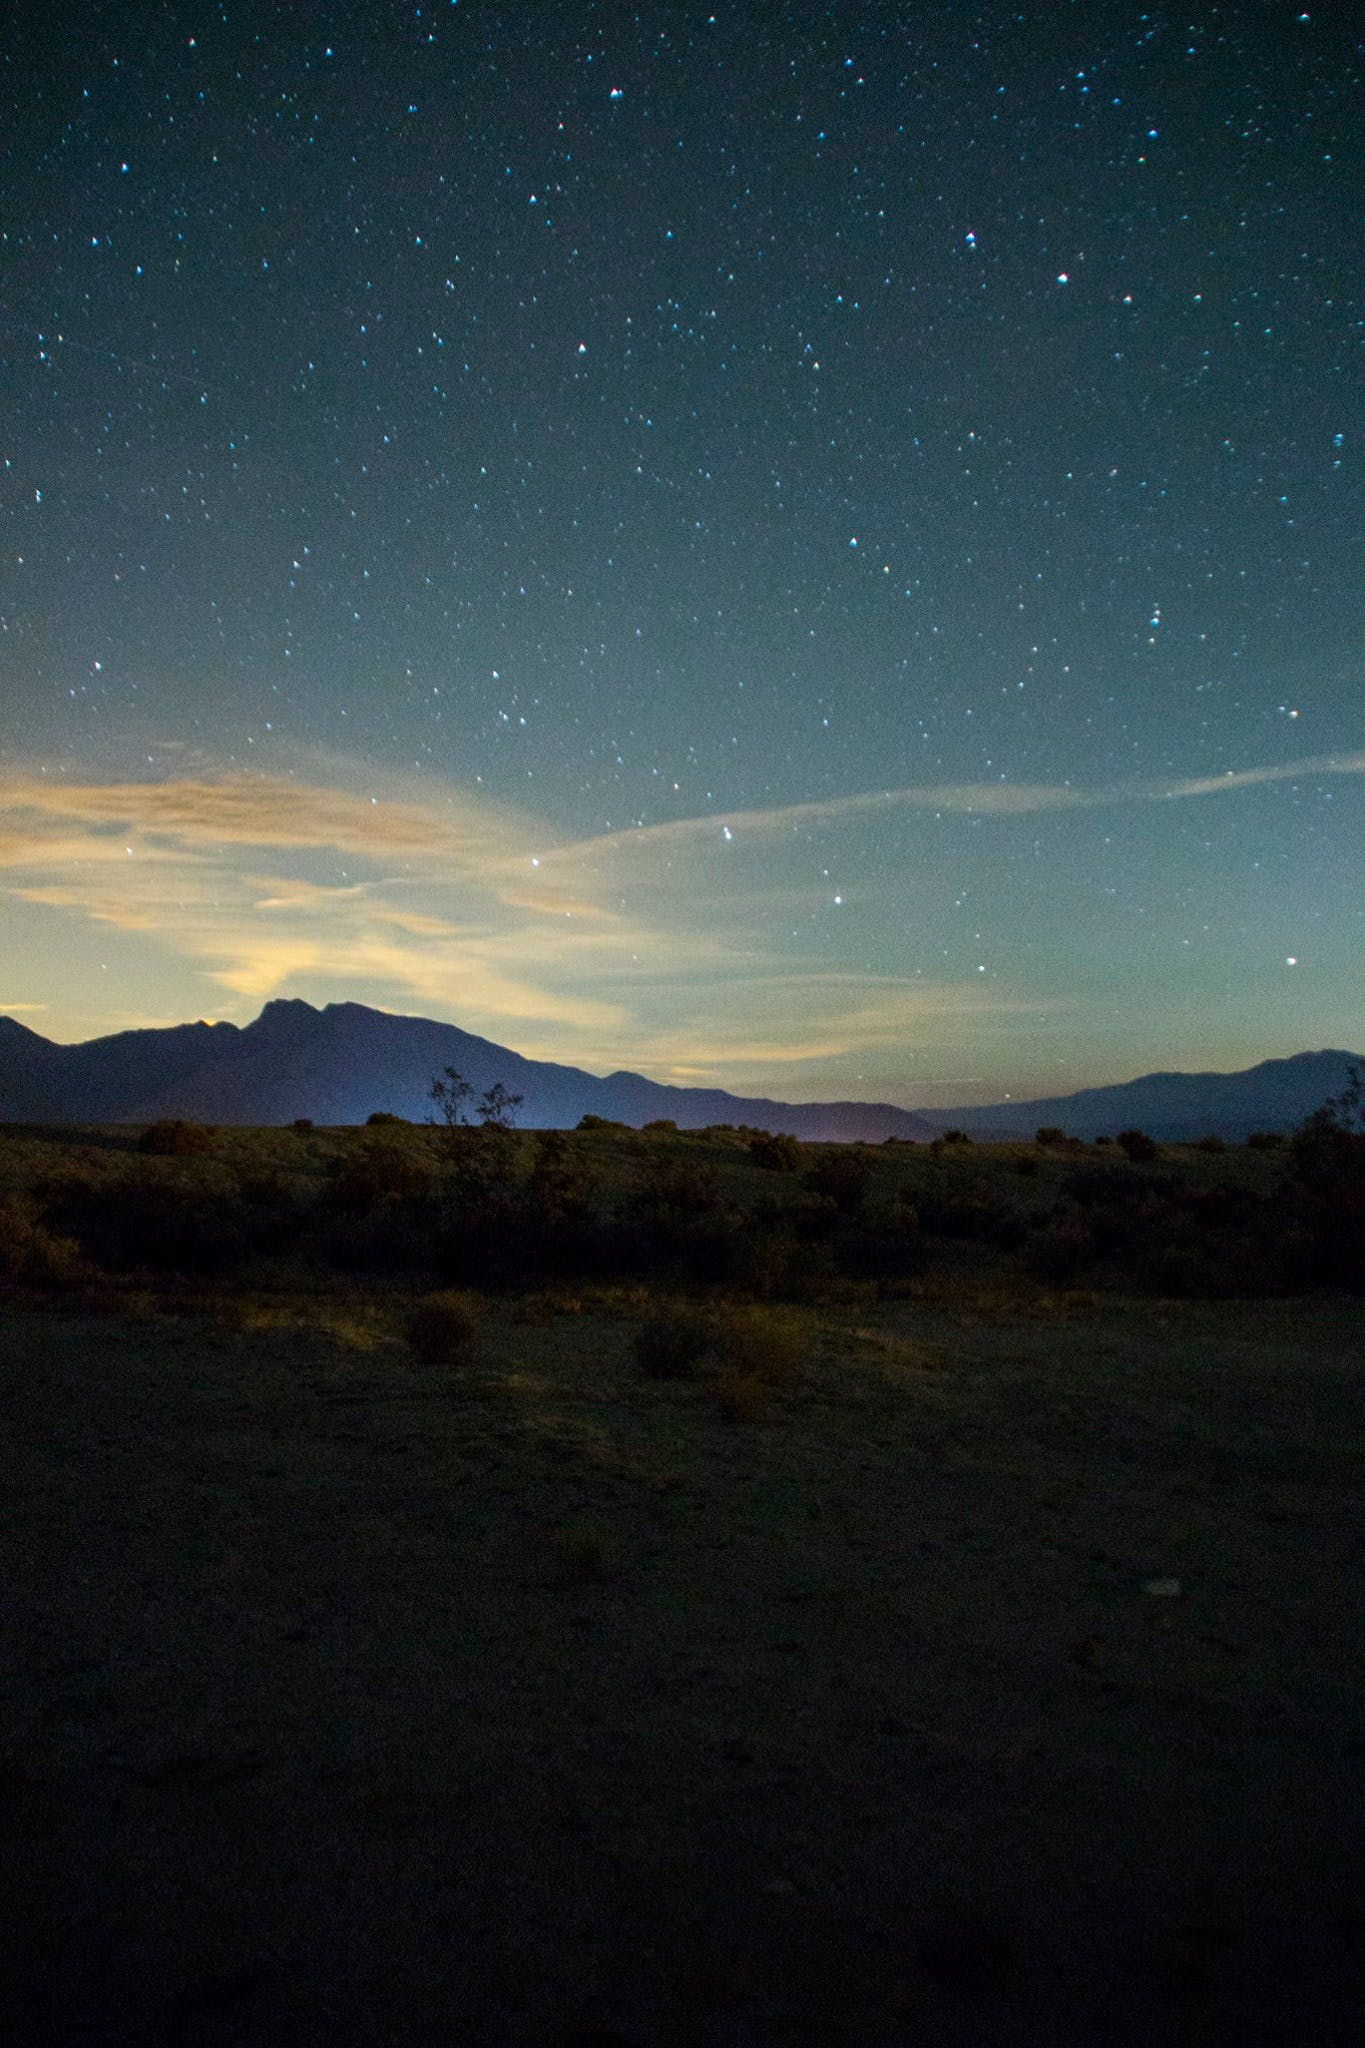 Free stock photo of california, desert, mountains, night